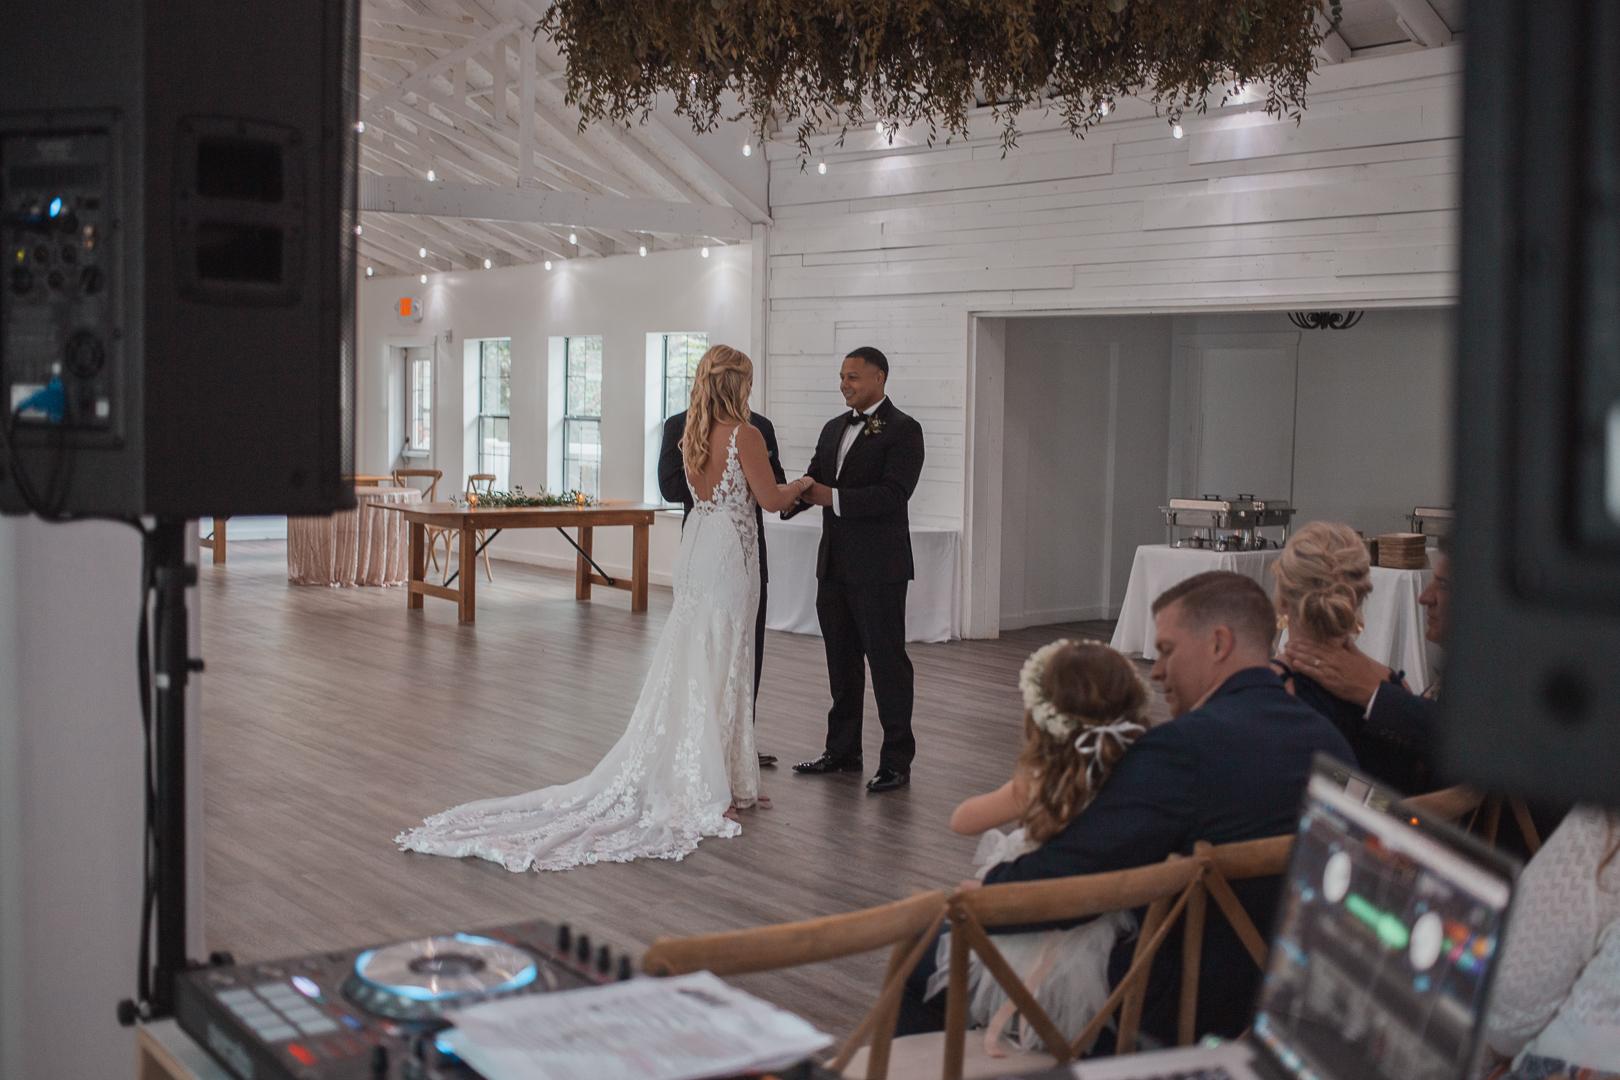 Aloson & Oree's Wedding (8-24-19) Edited5885.jpg